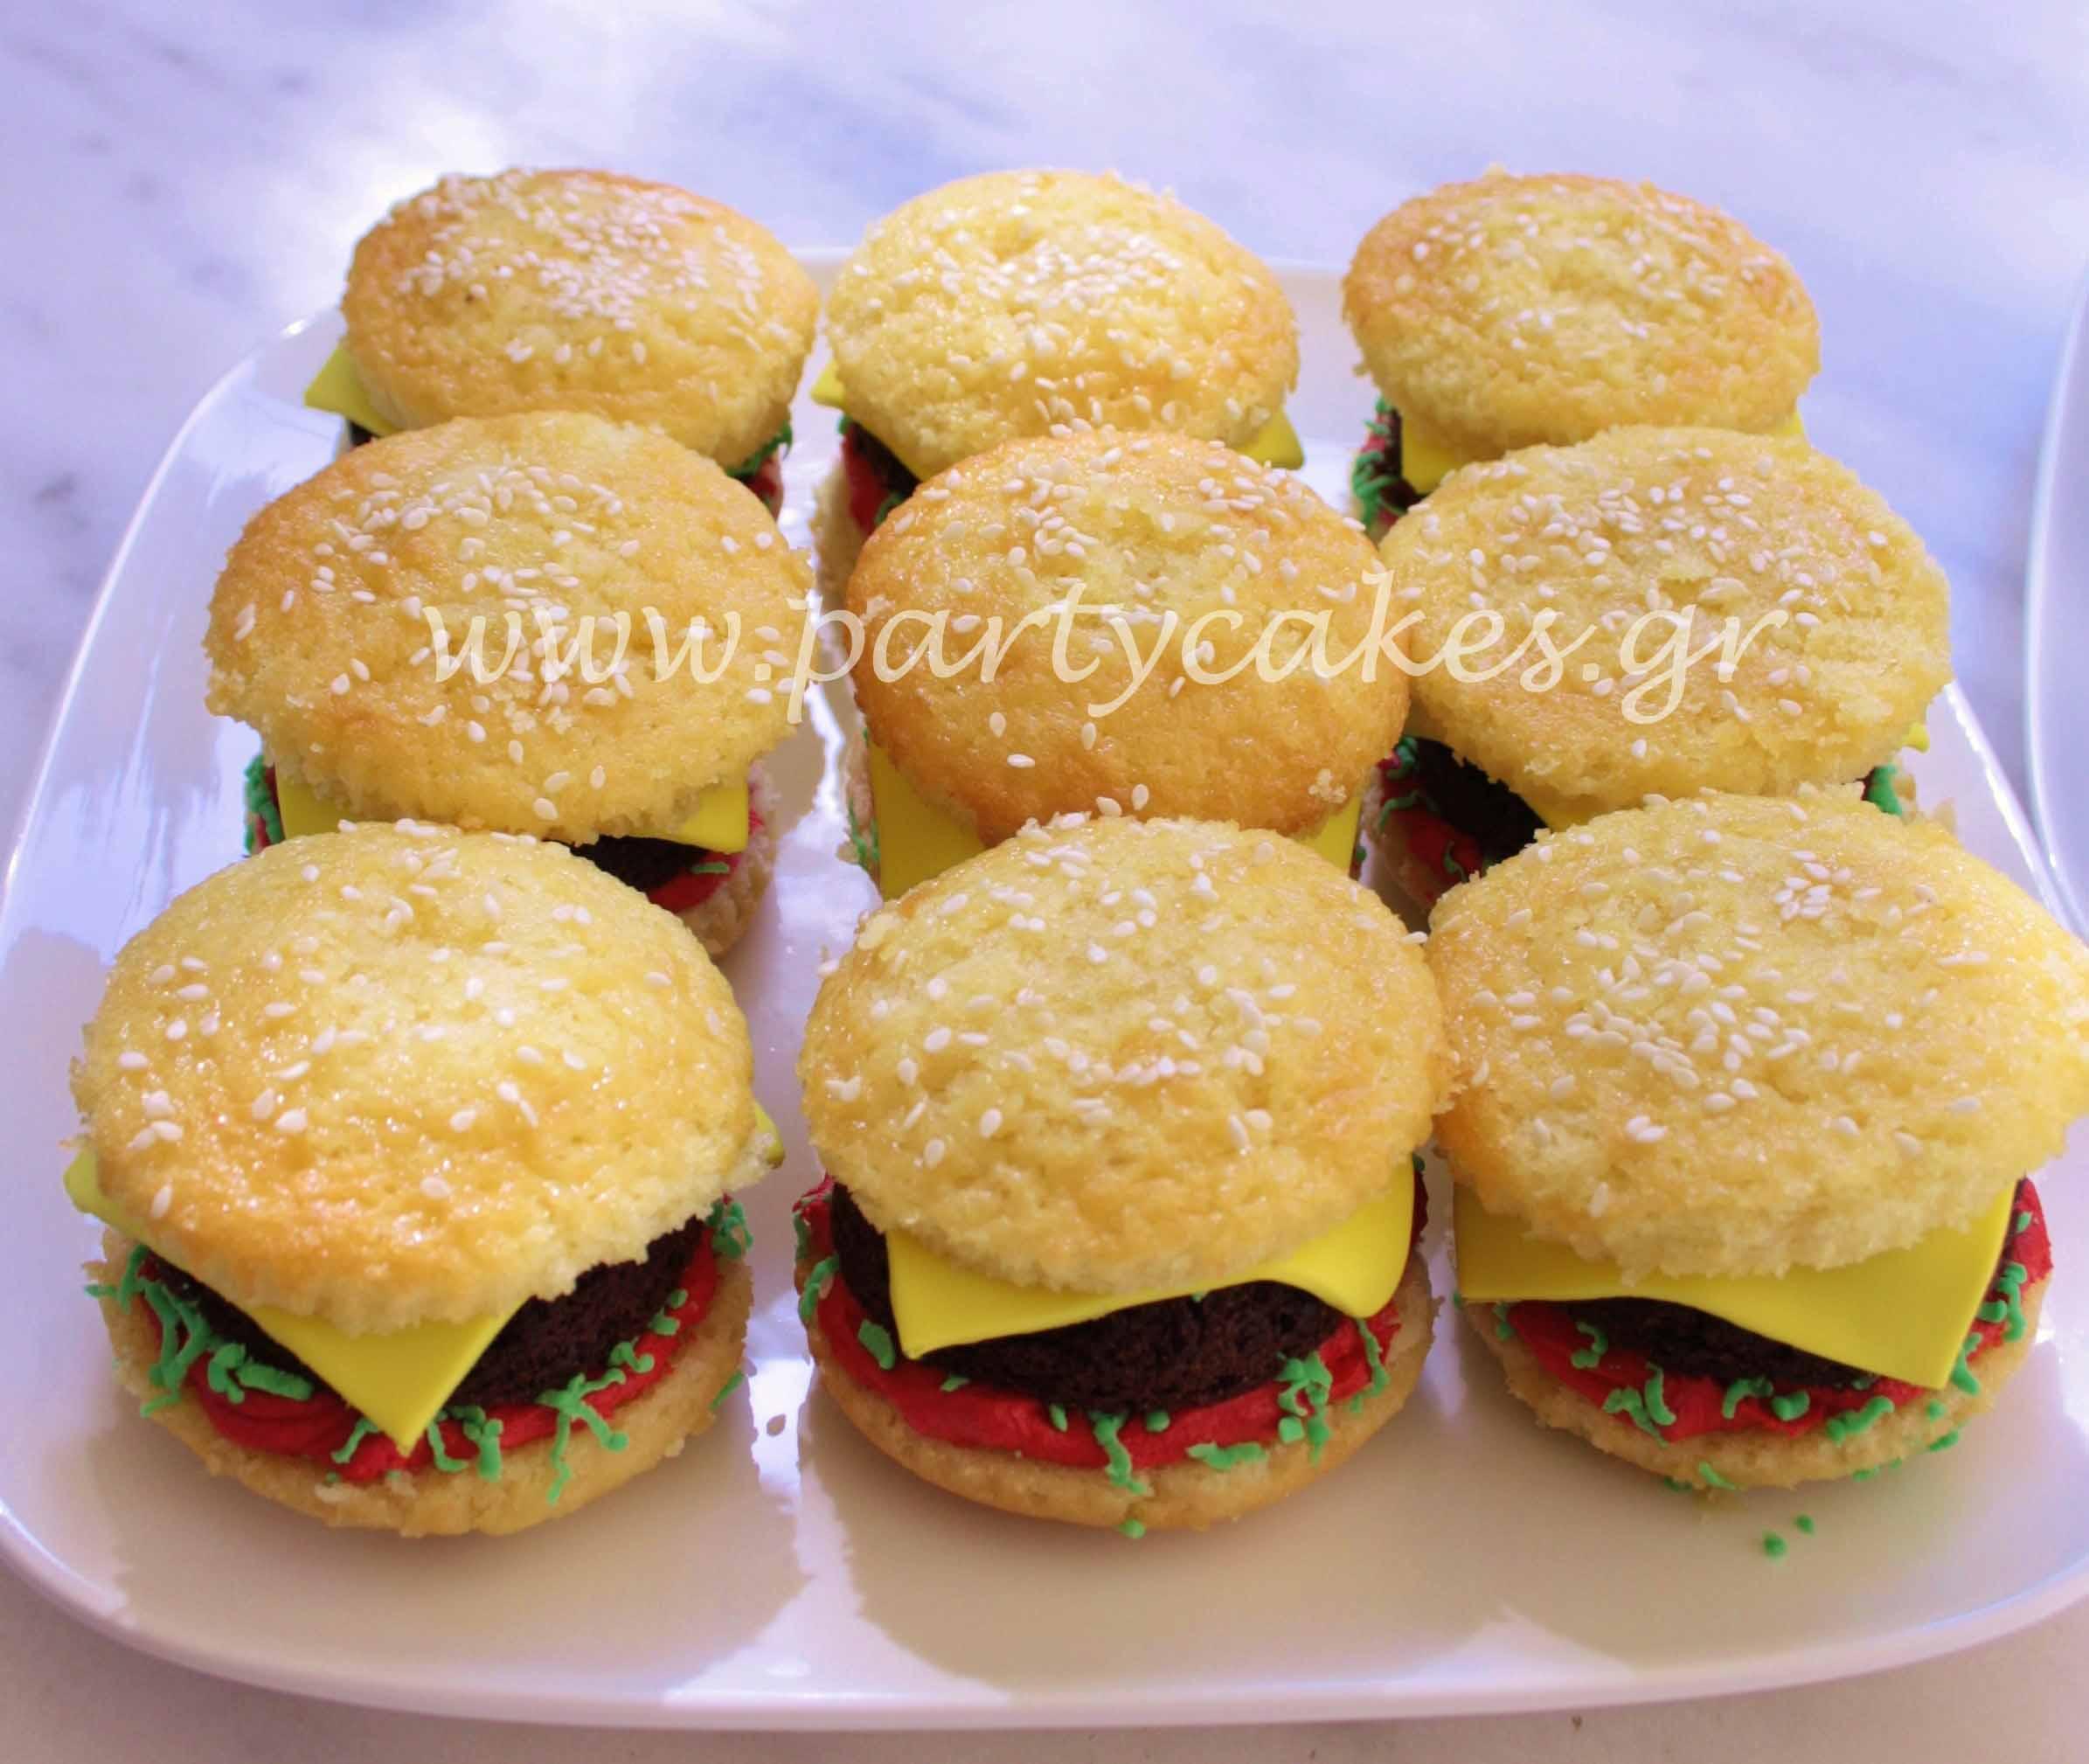 BBQ+cupcakes+2+copy.jpg